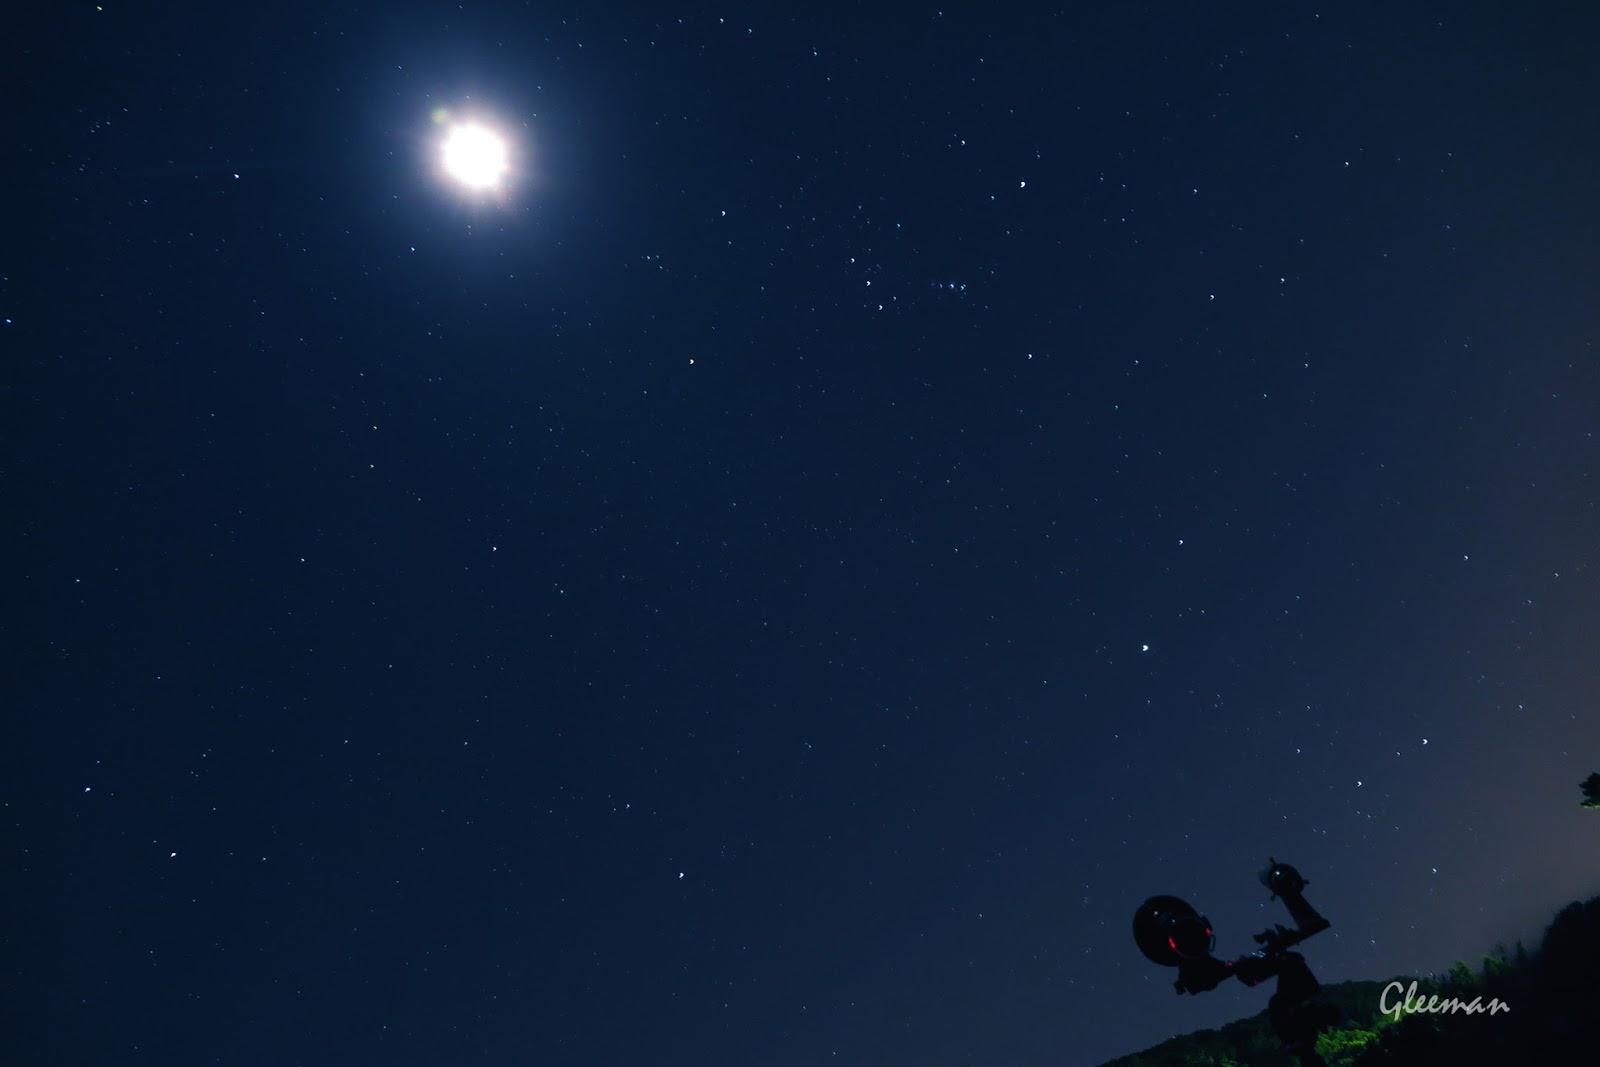 moon, 拍彗星的同時,凱凱用Canon G1x MK2 在一旁拍的^^ 月亮還蠻亮的